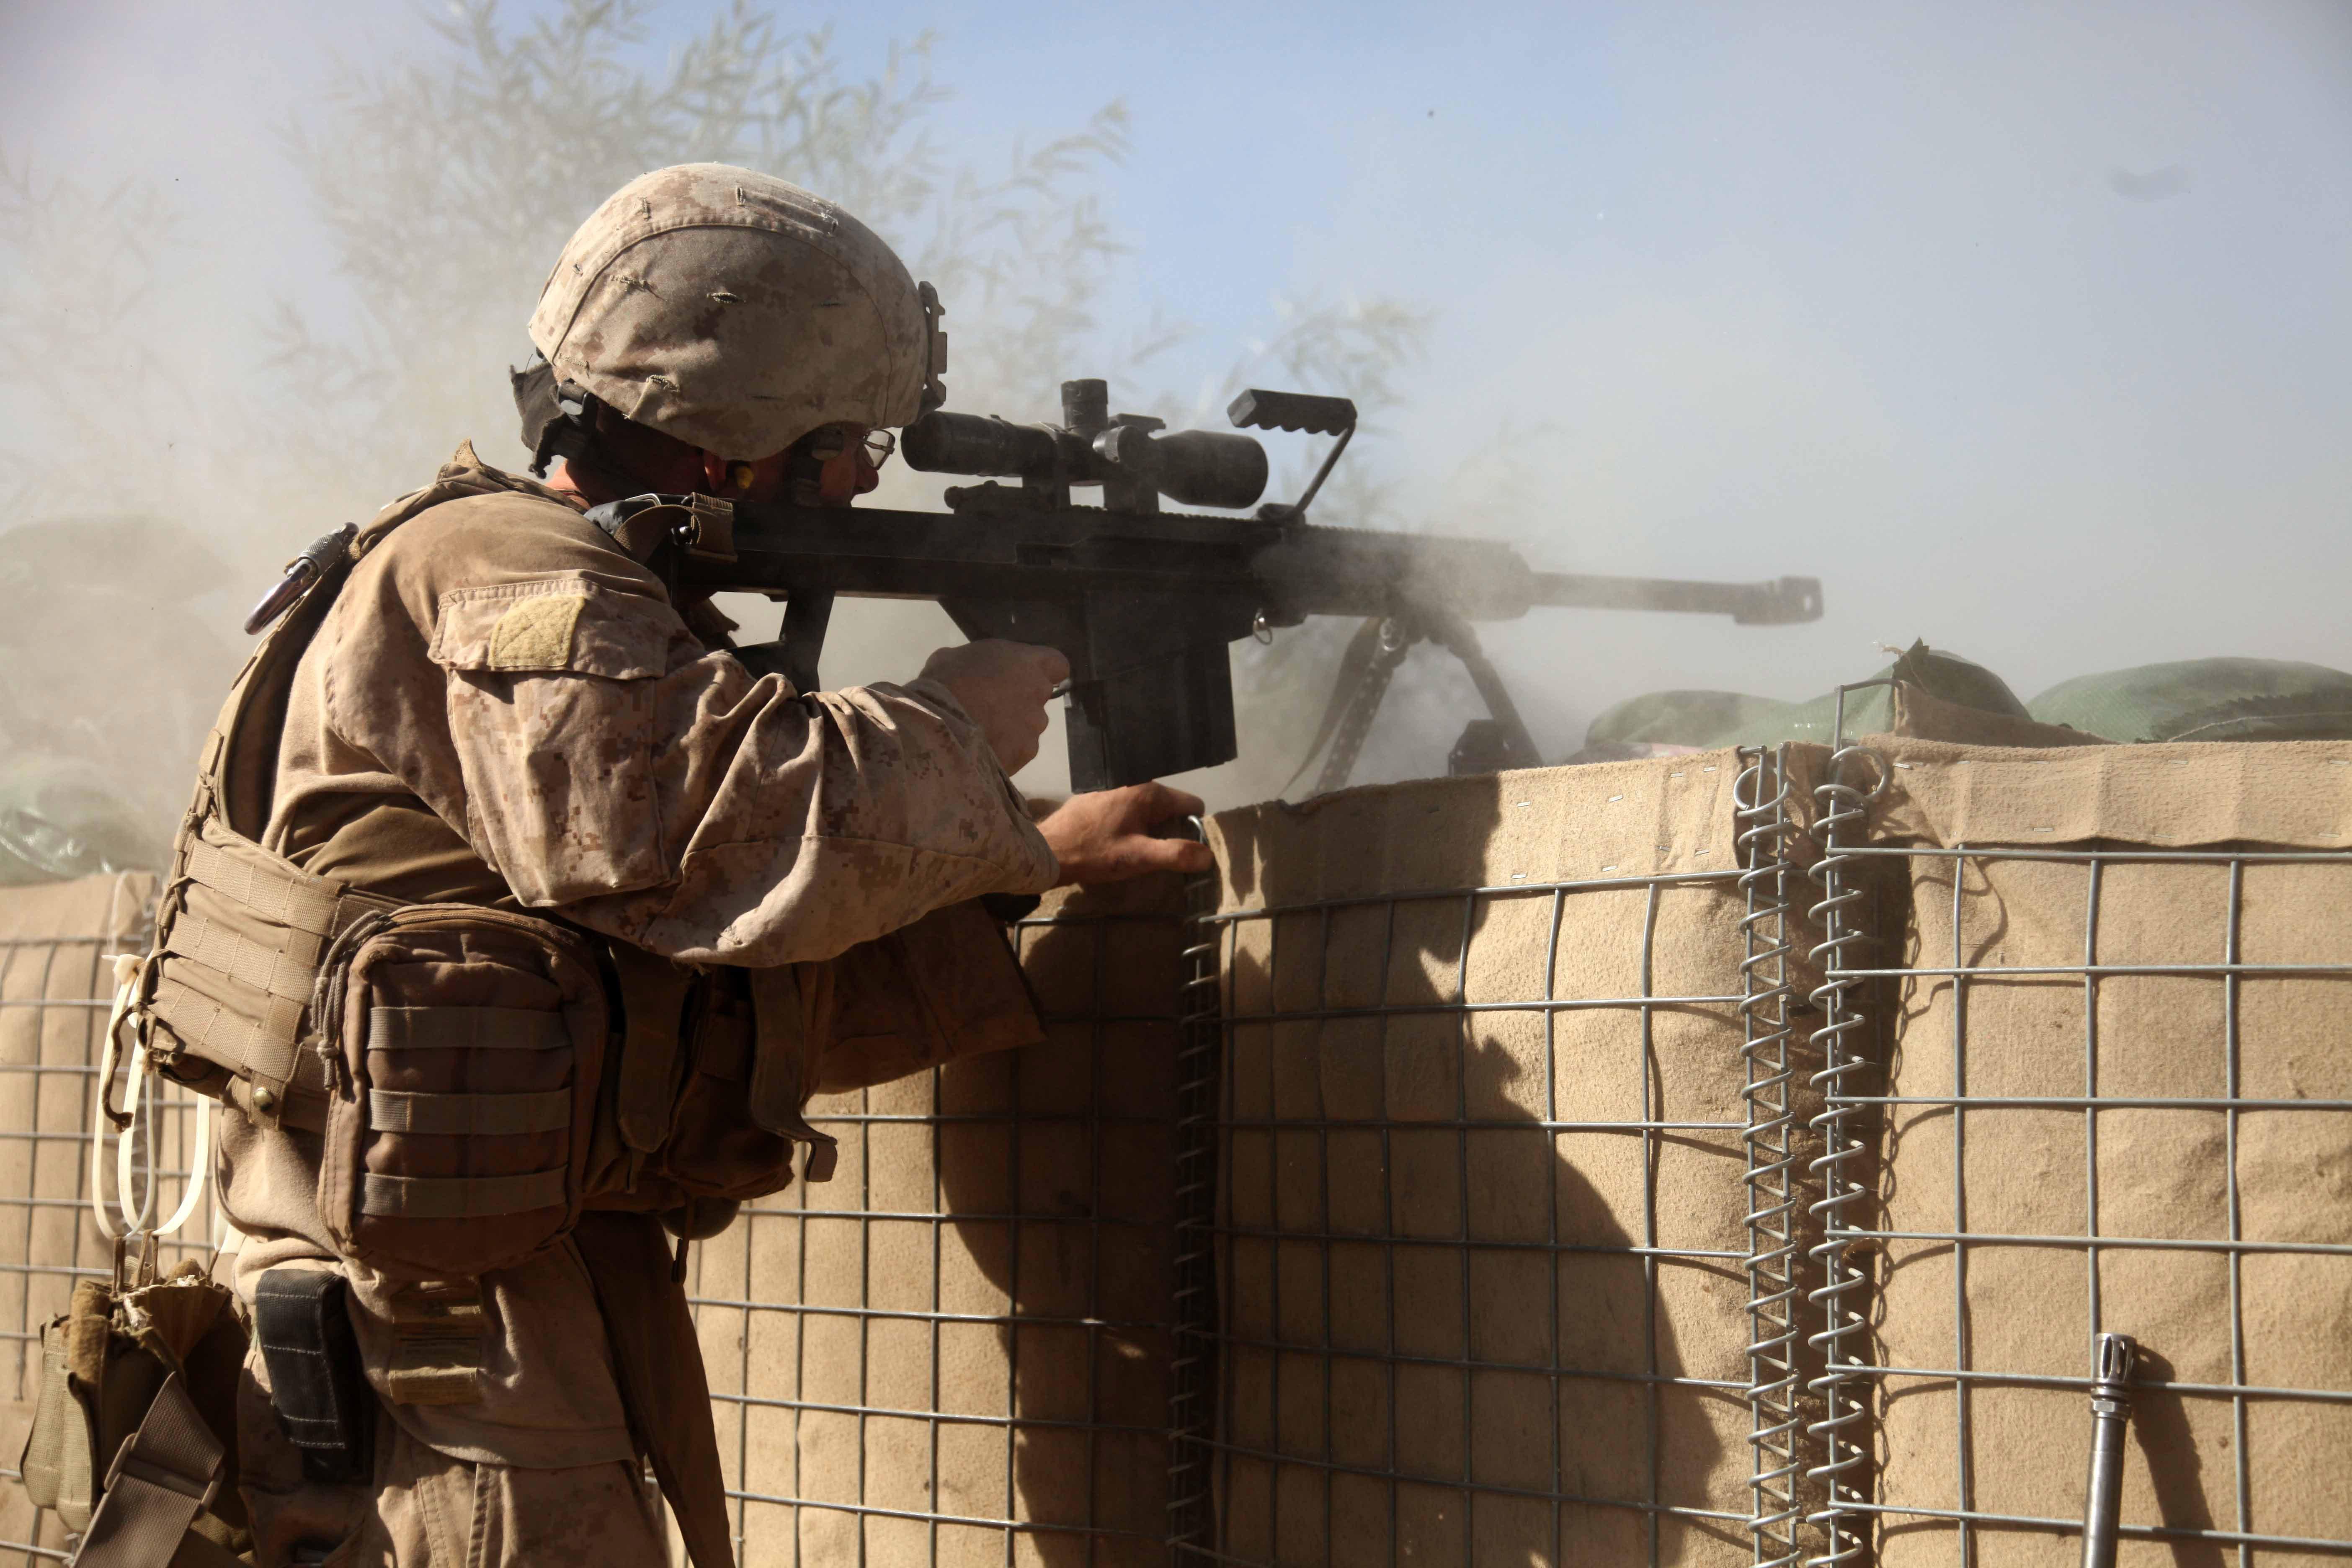 File:Defense.gov News Photo 101109-M-3952S-031 - U.S. Marine Corps ...